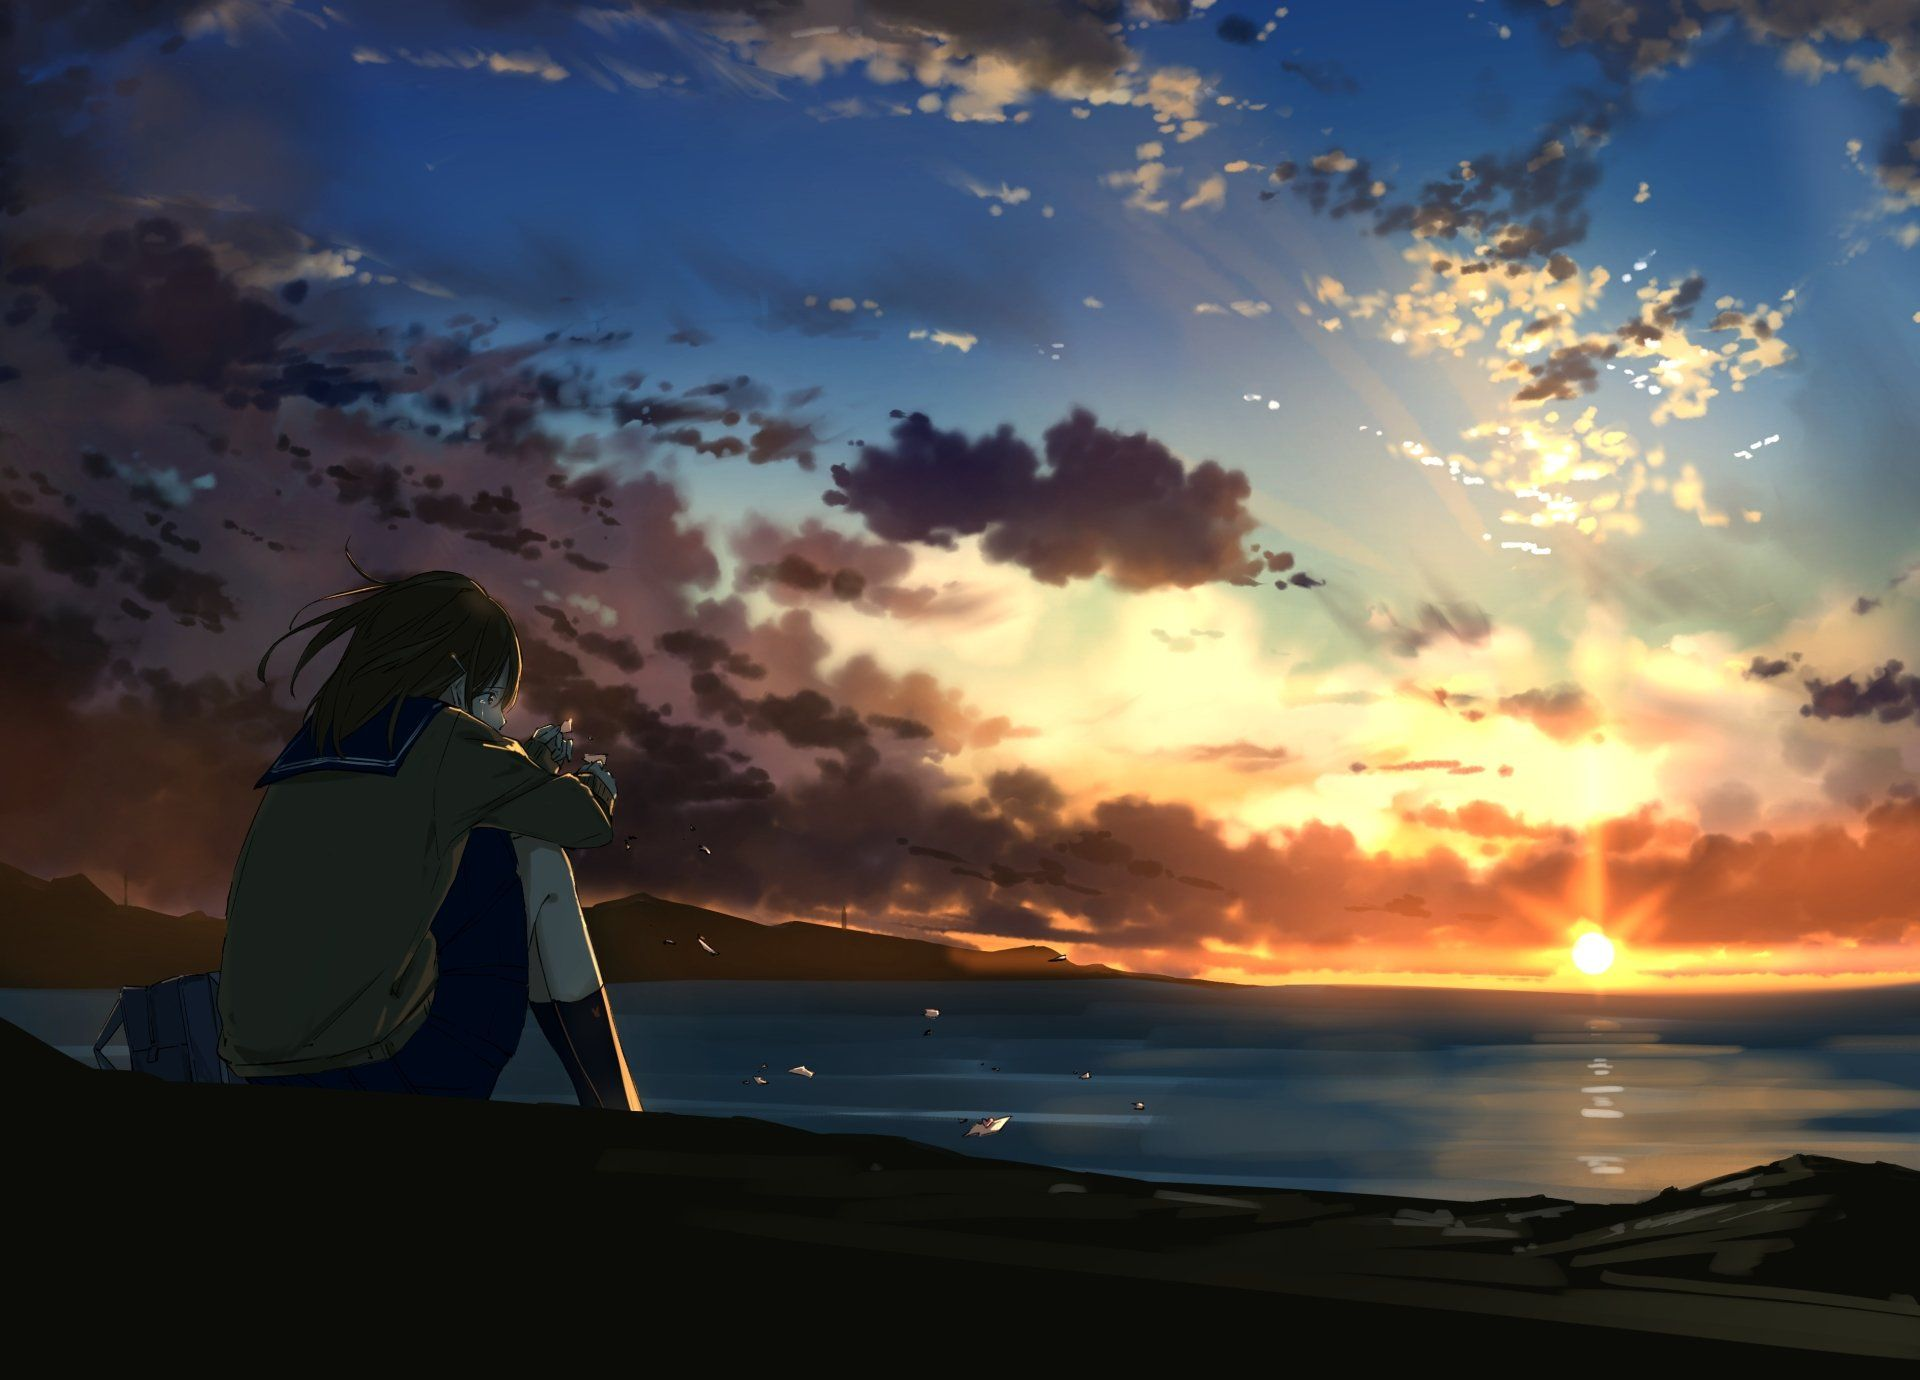 Anime If You Like It Follow Me Pls Wallpaper Abyss Anime Scenery Anime Scenery Wallpaper Anime Background